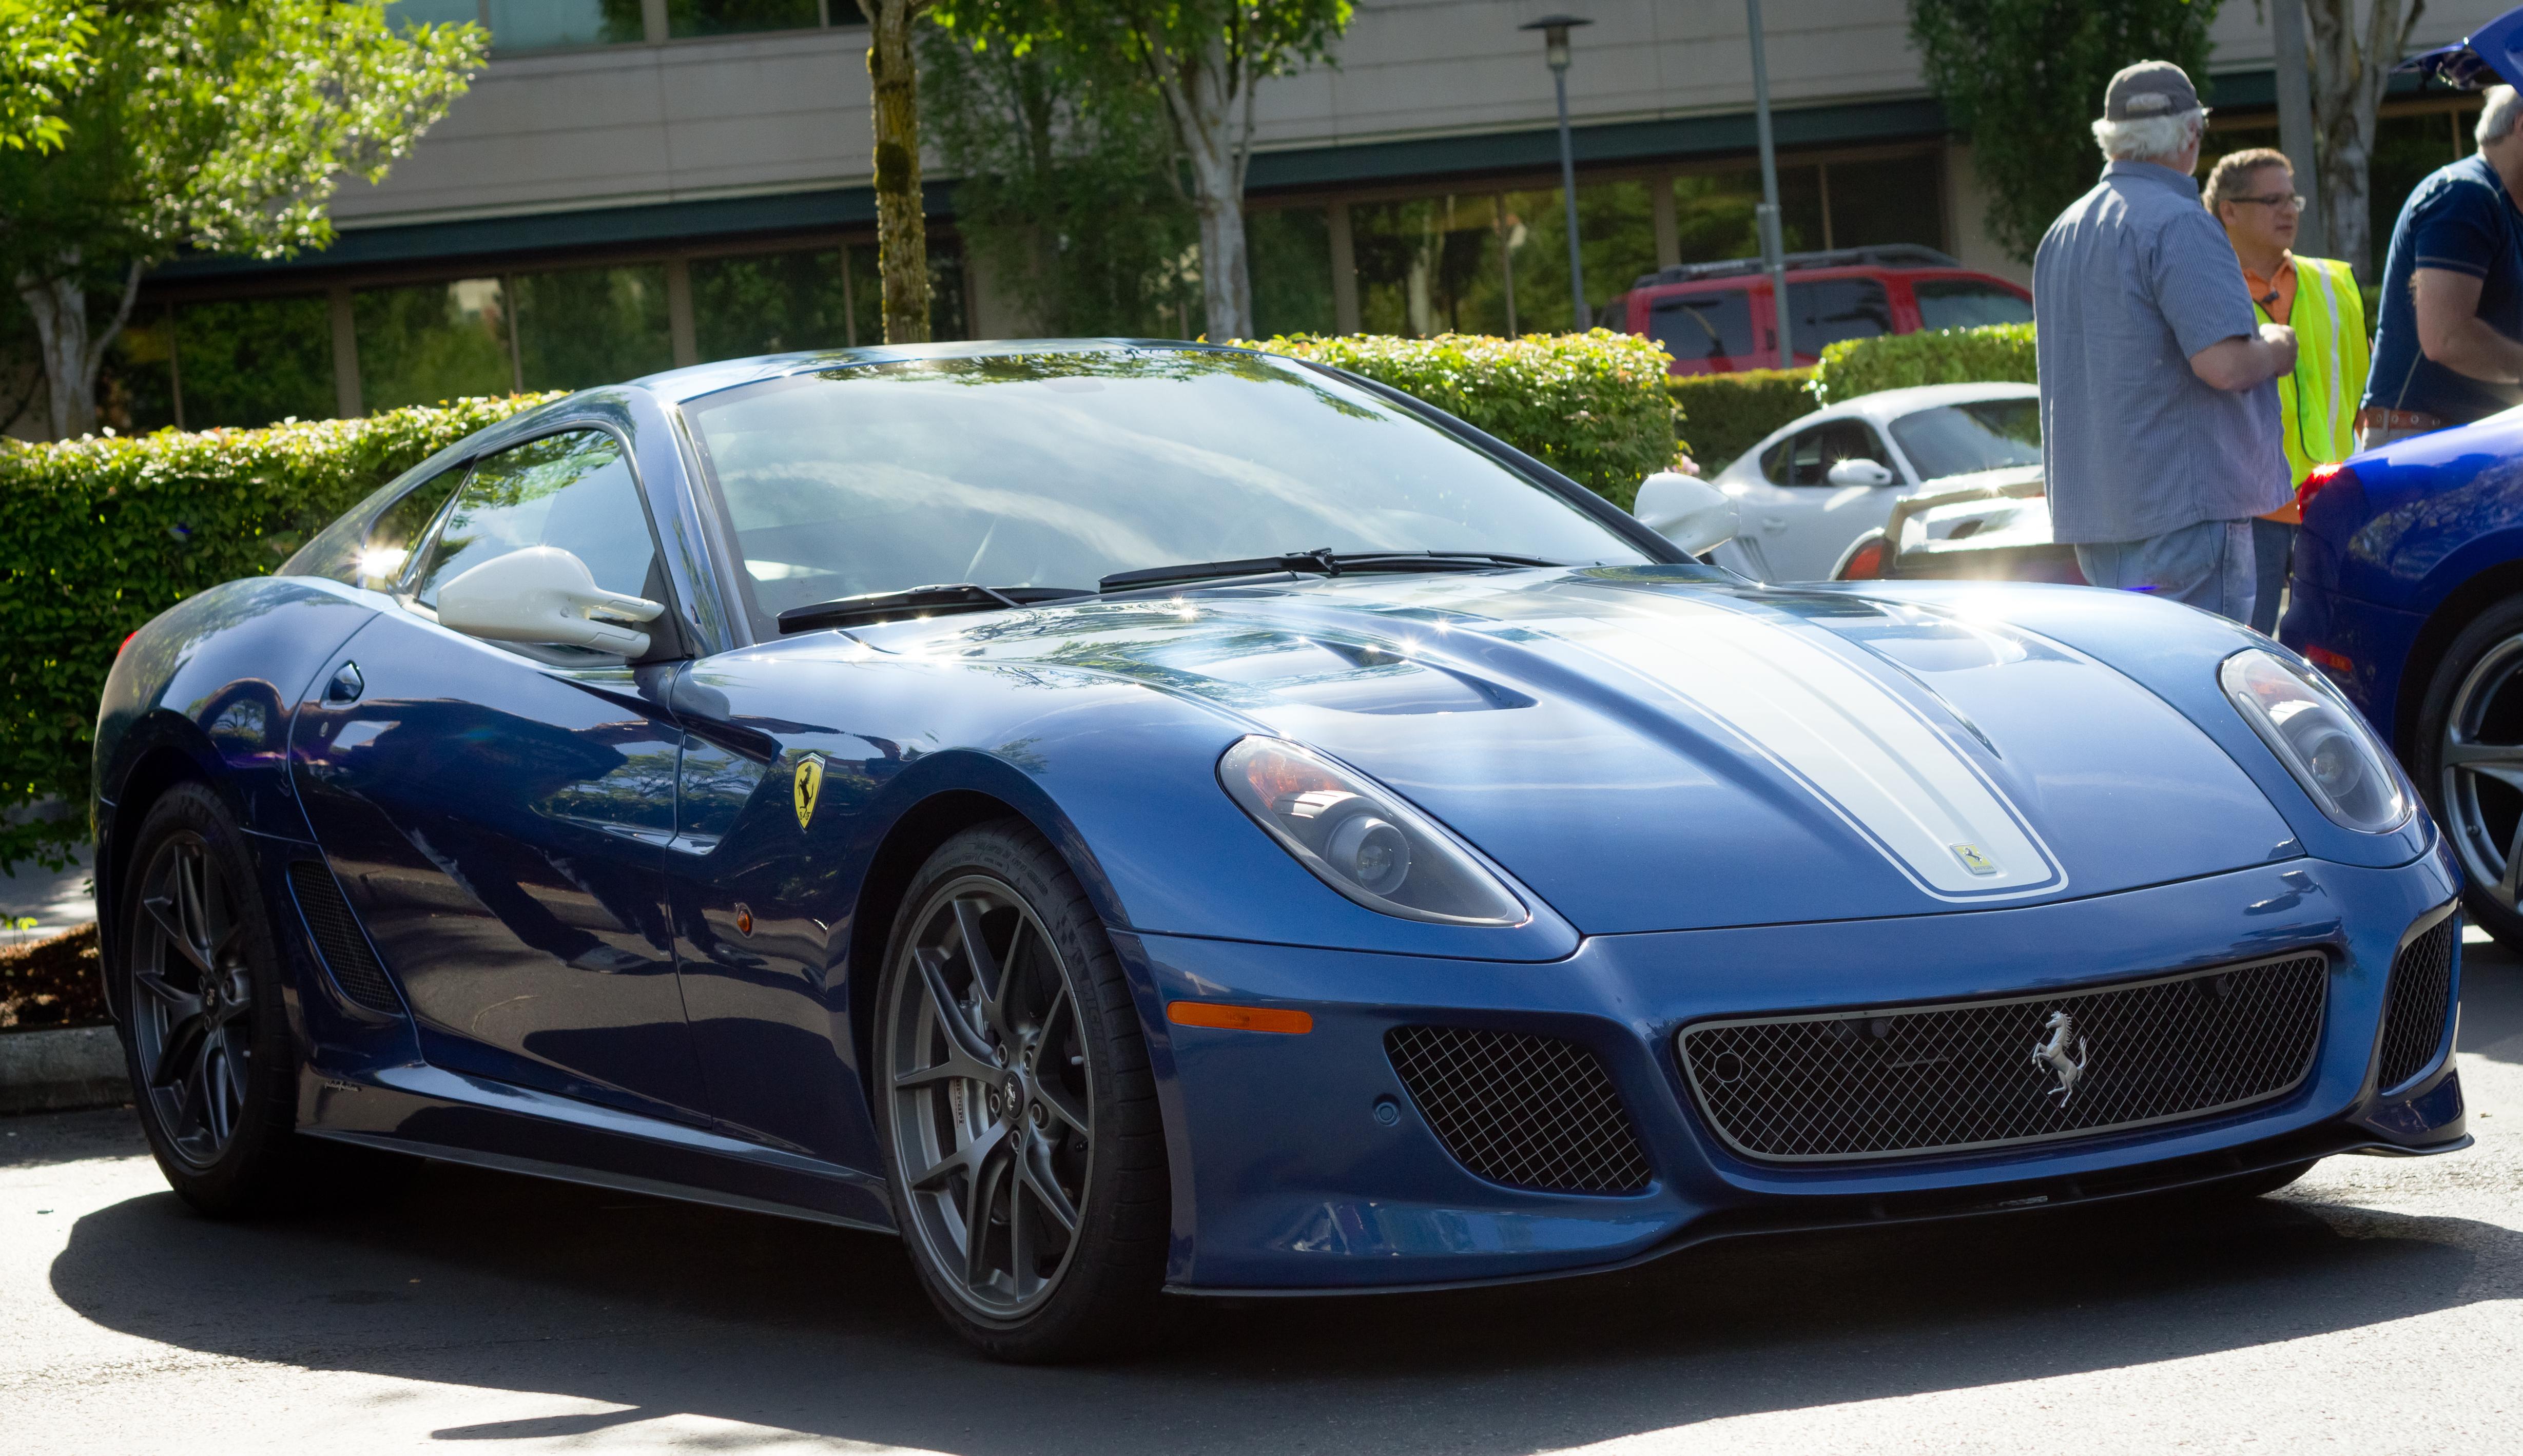 File:Ferrari 599 GTO.jpg